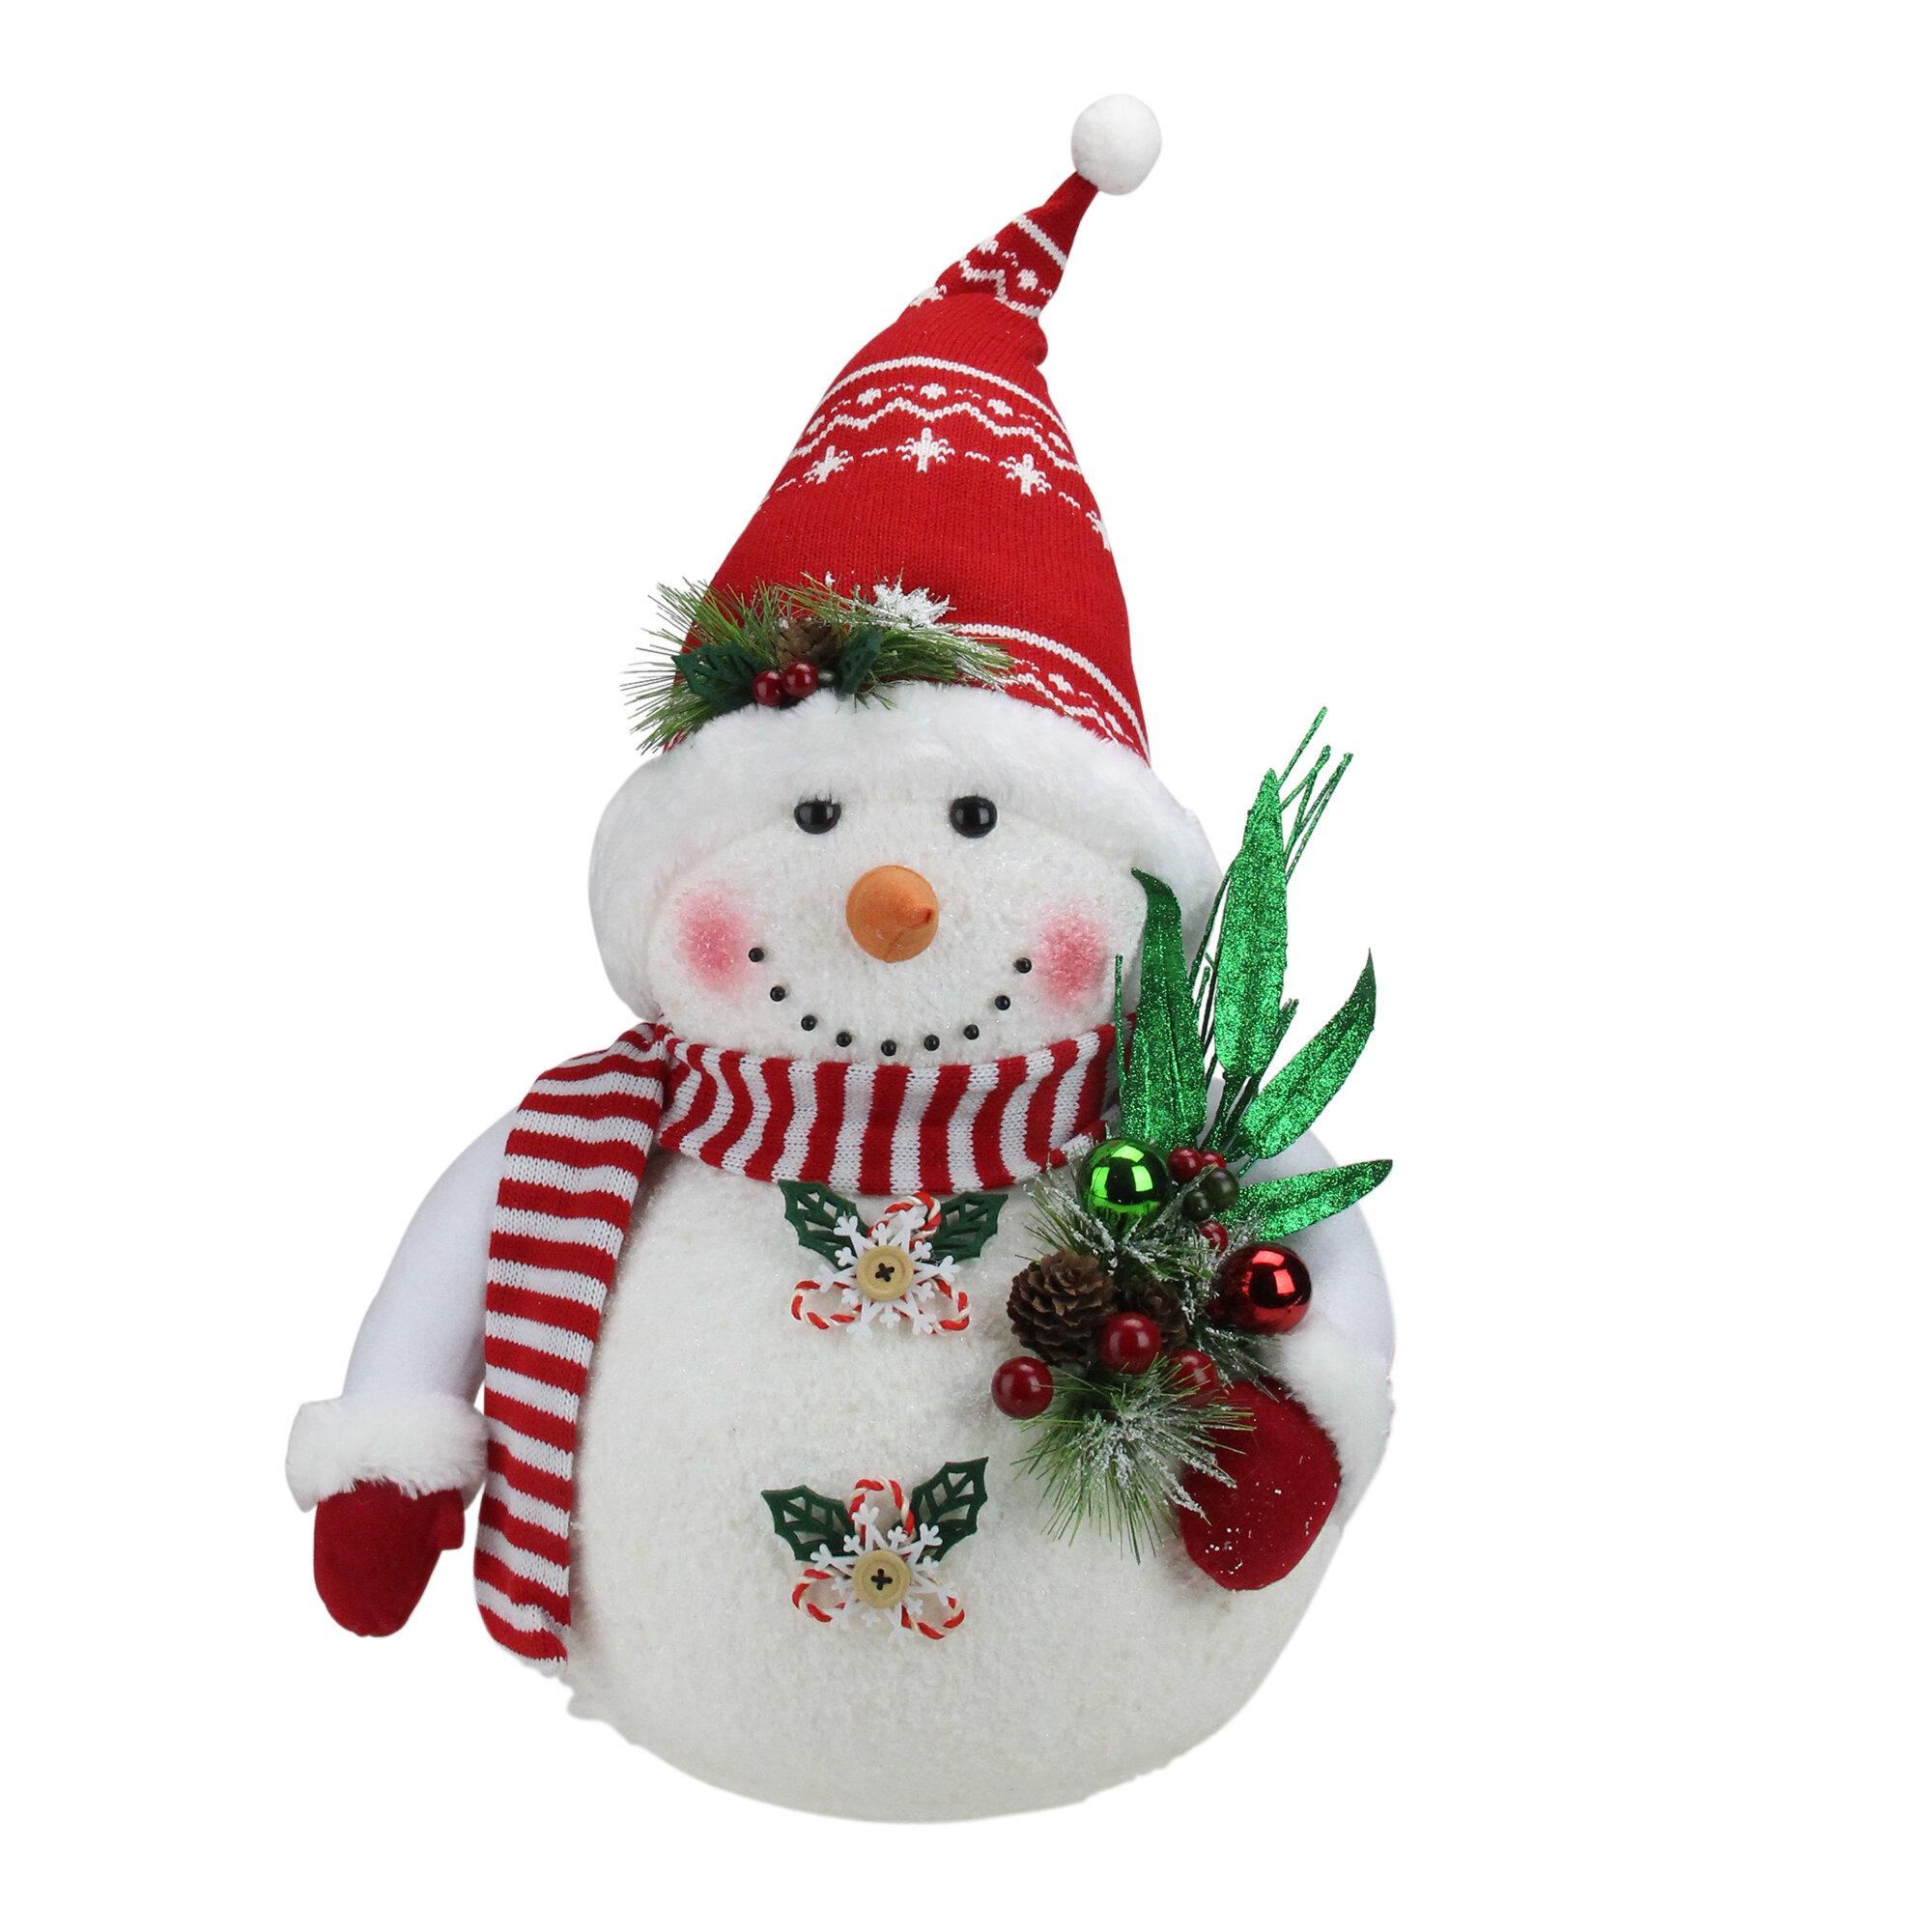 Northlight Alpine Chic Sparkling Snowman With Nordic Style Santa Hat Christmas Decoration Wayfair